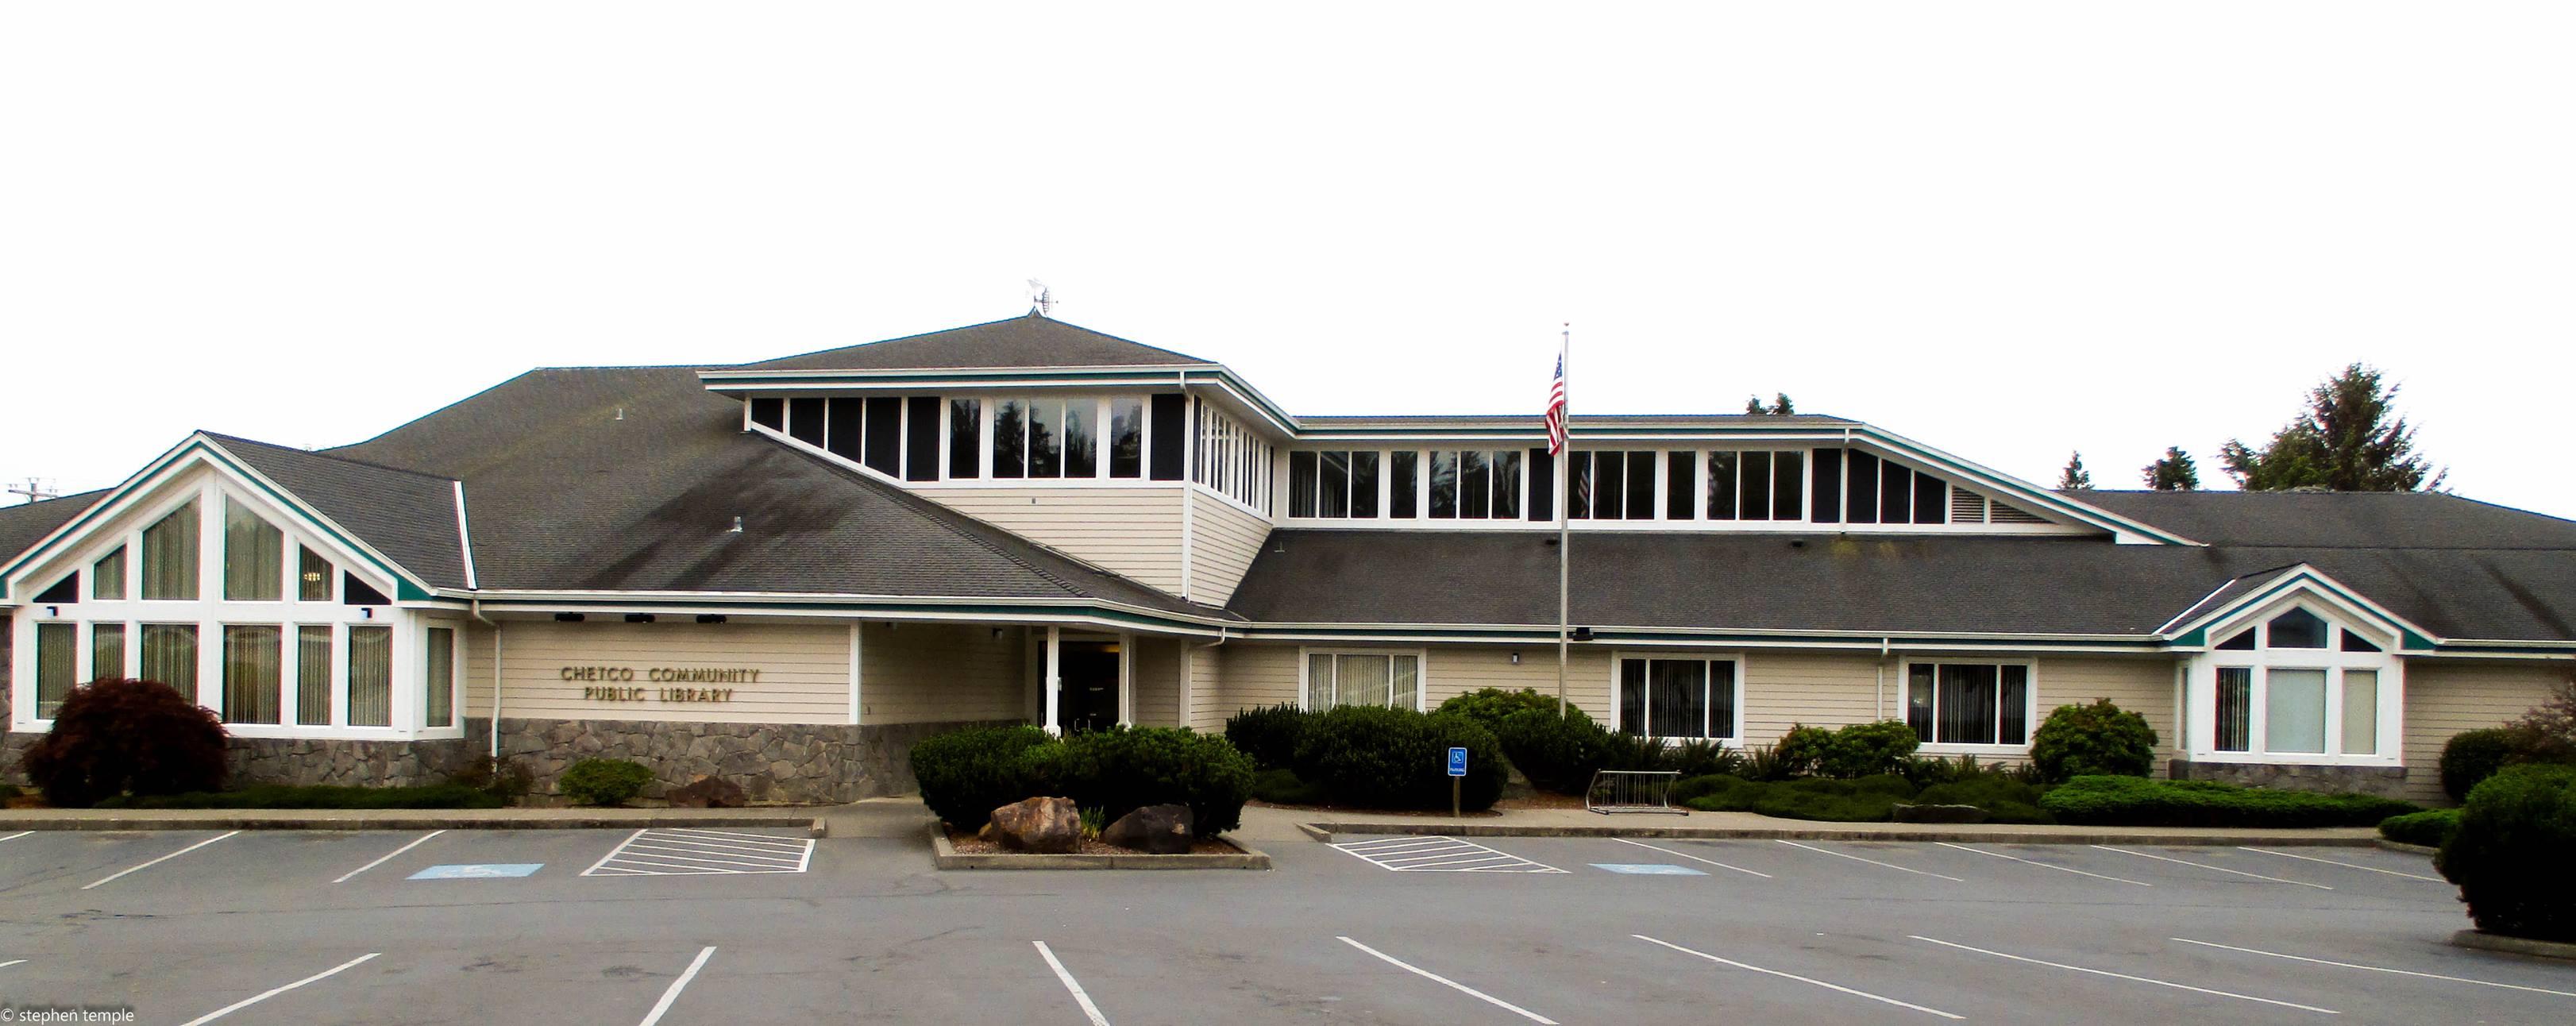 Chetco Community Public Library.jpg